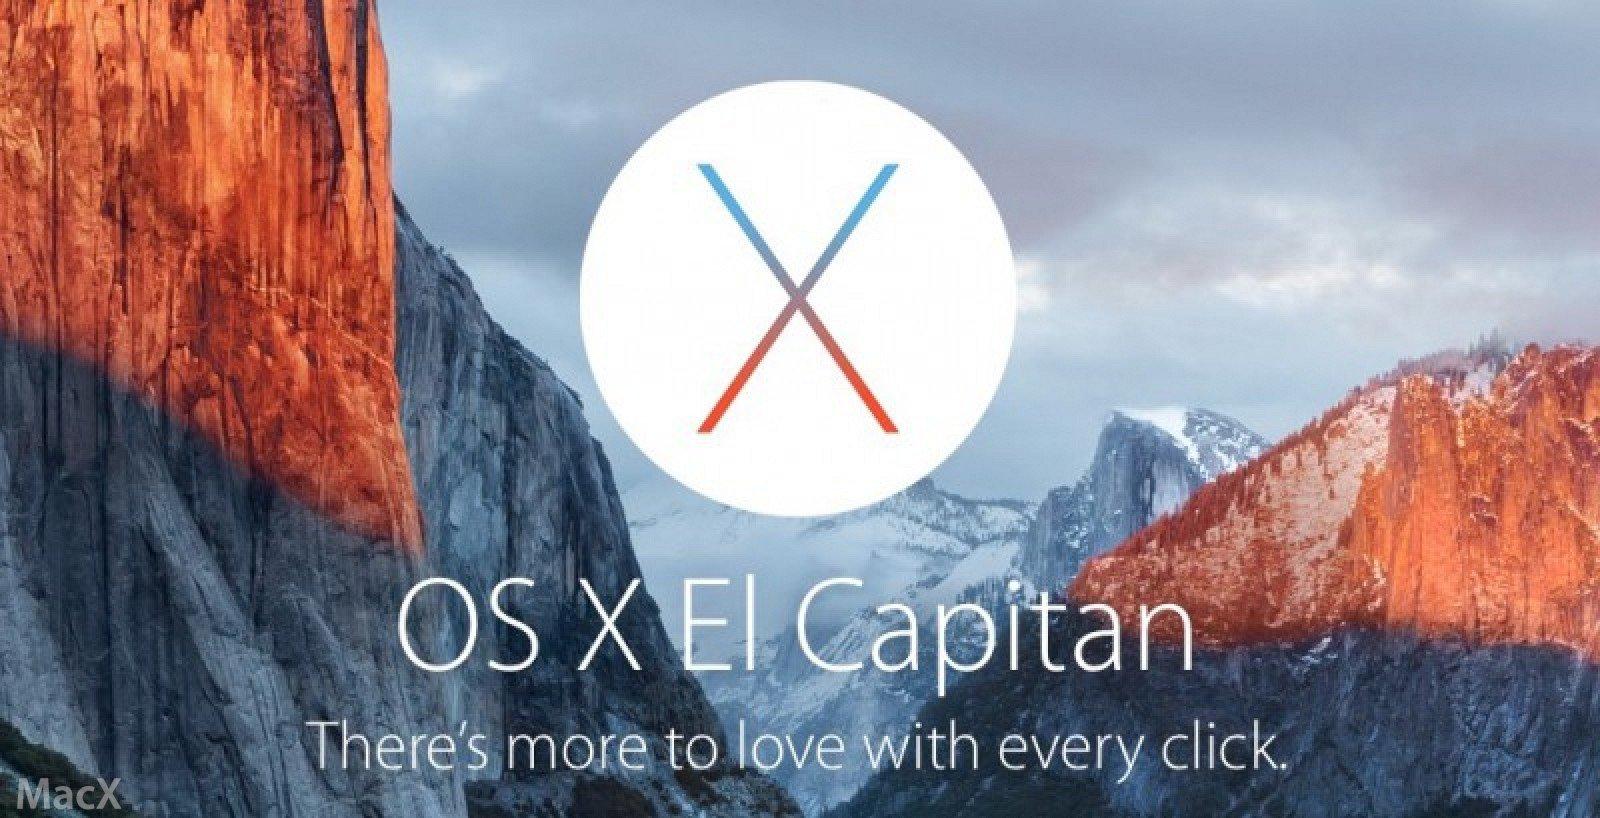 OS2 苹果发布 OS X El Capitan 第五个公测版